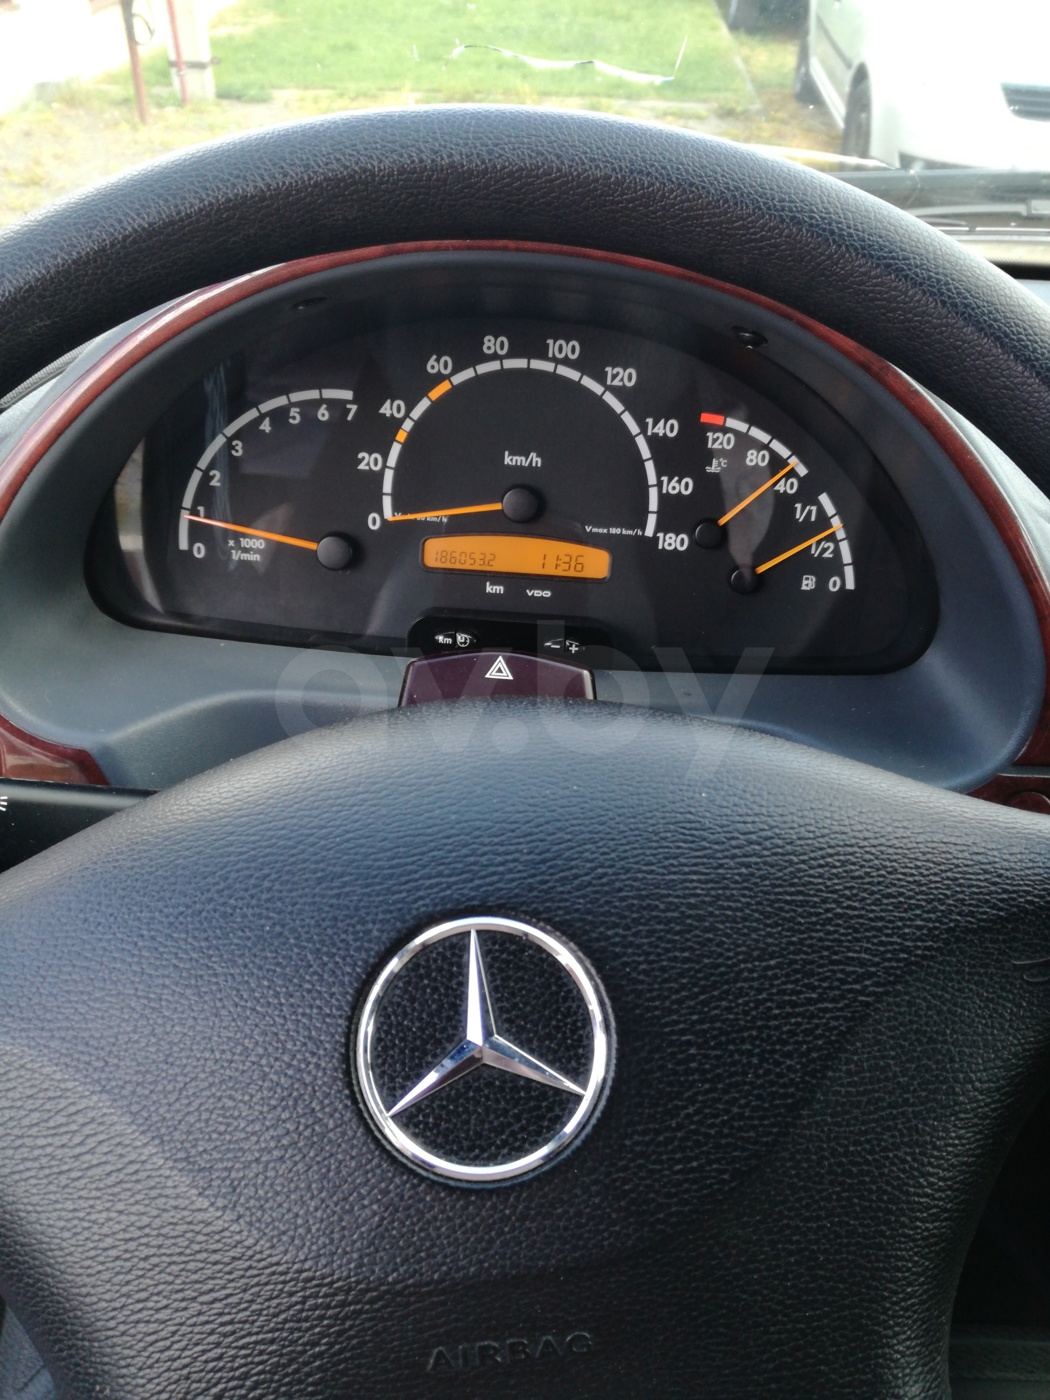 Mercedes-Benz Sprinter, 2014 г.